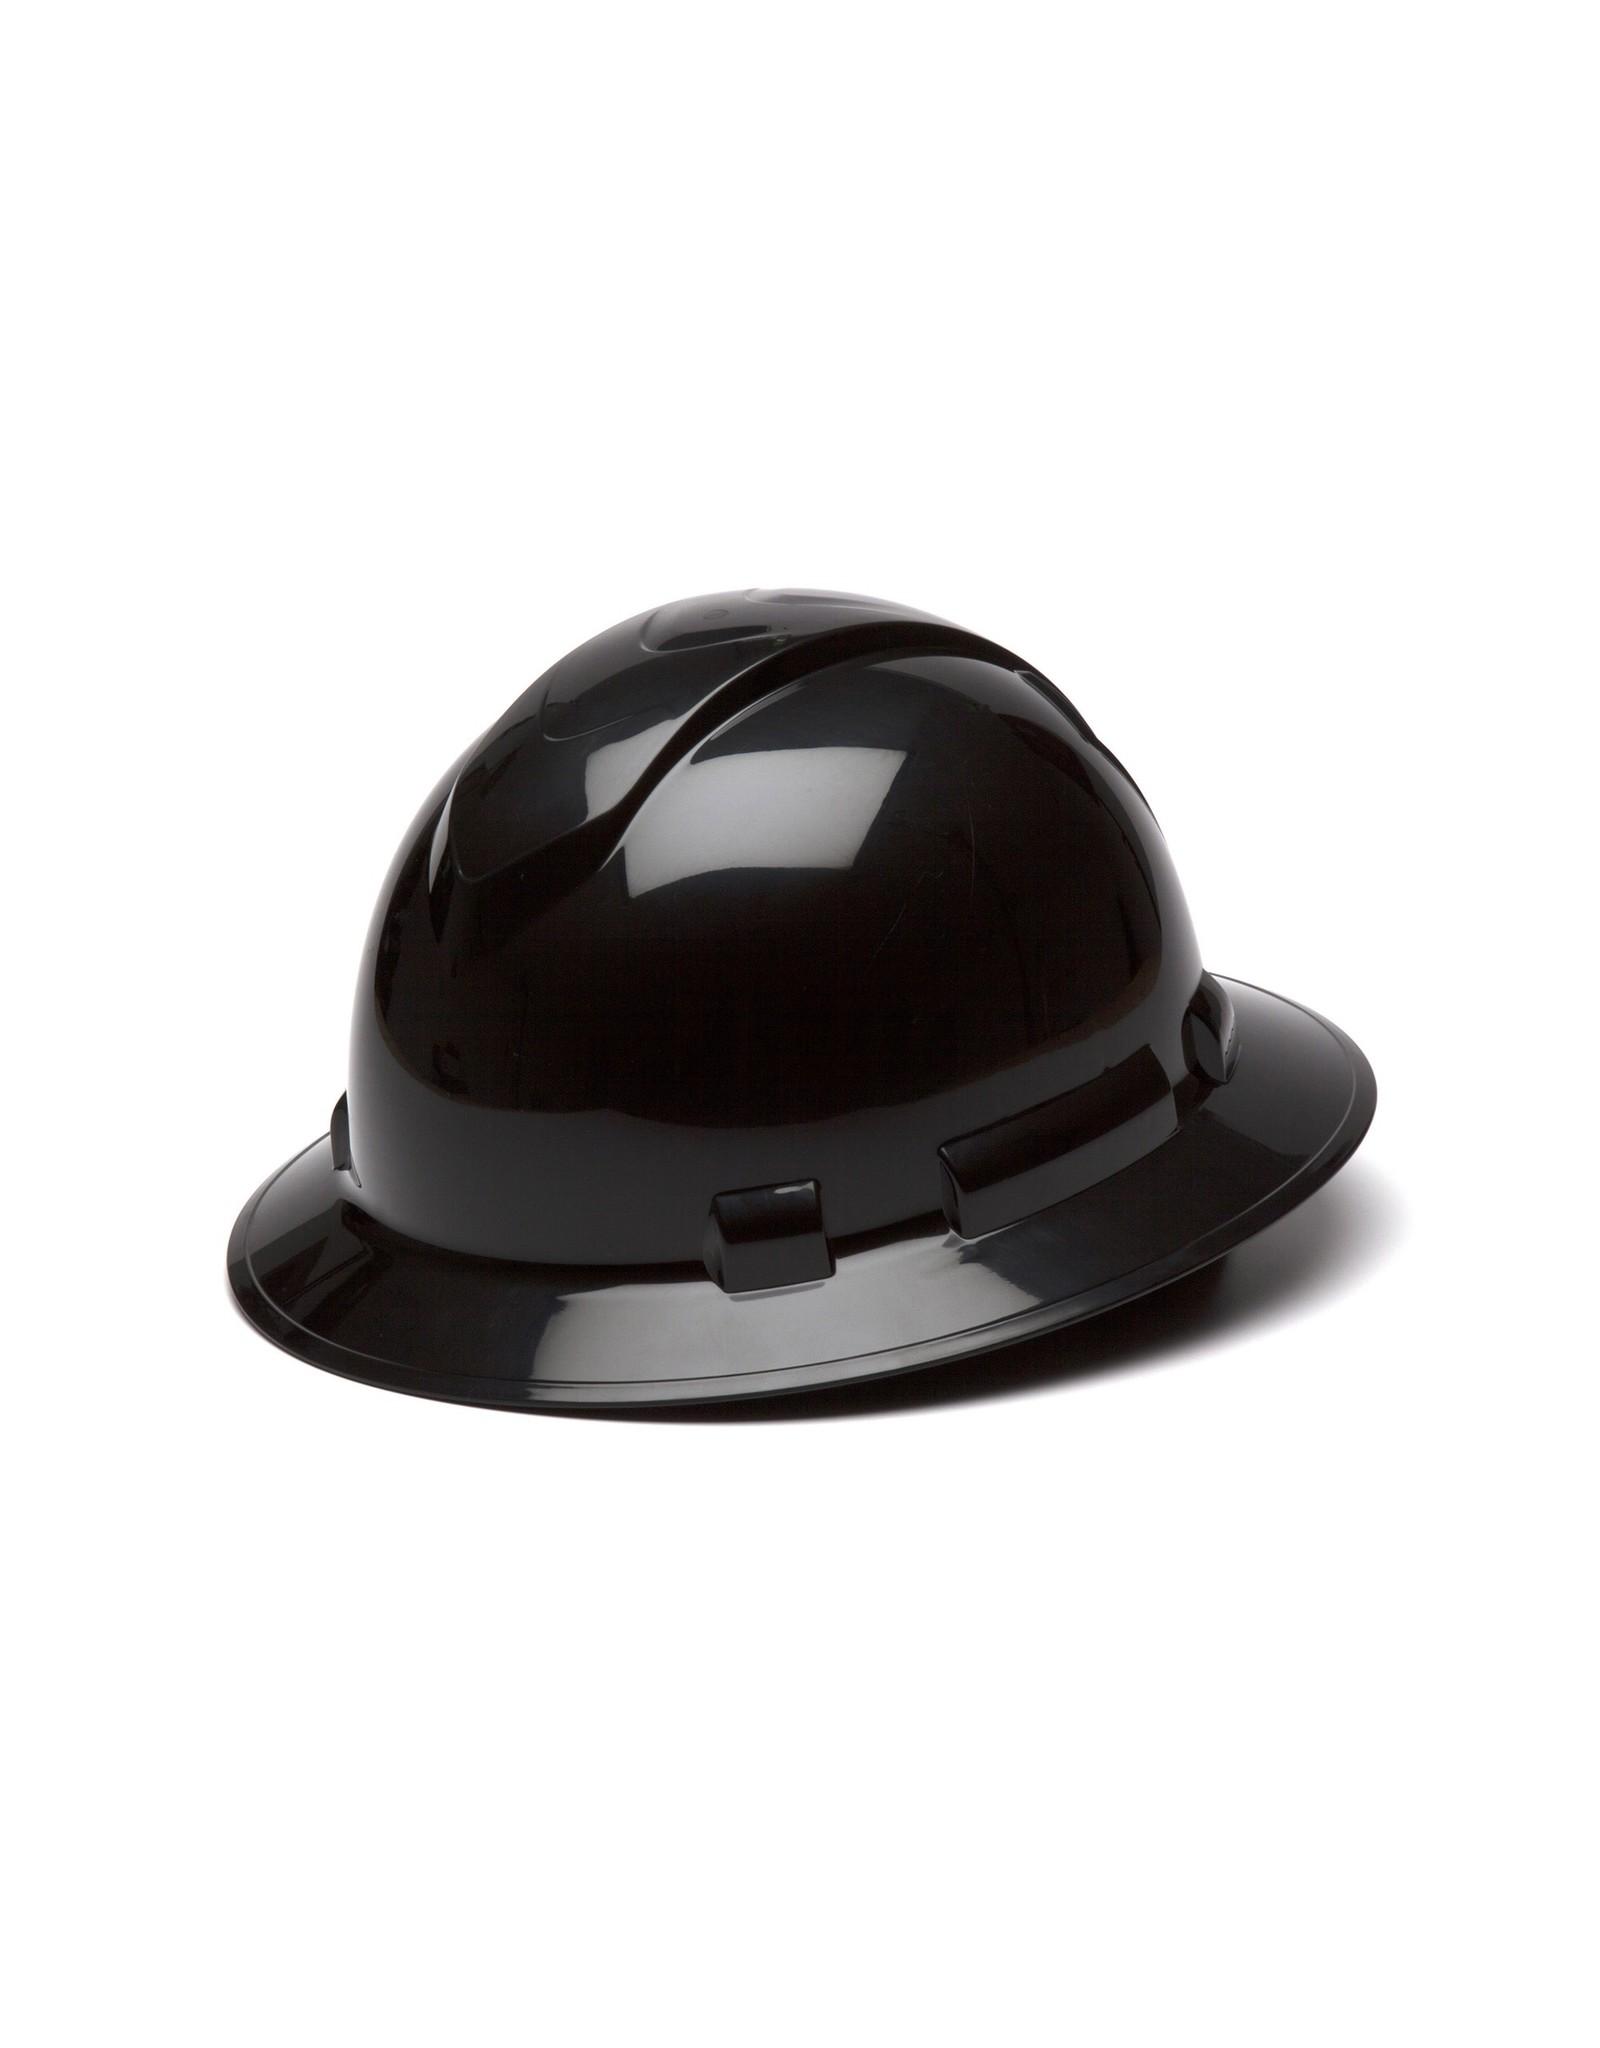 Pyramex Ridgeline Full Brim Hard Hat